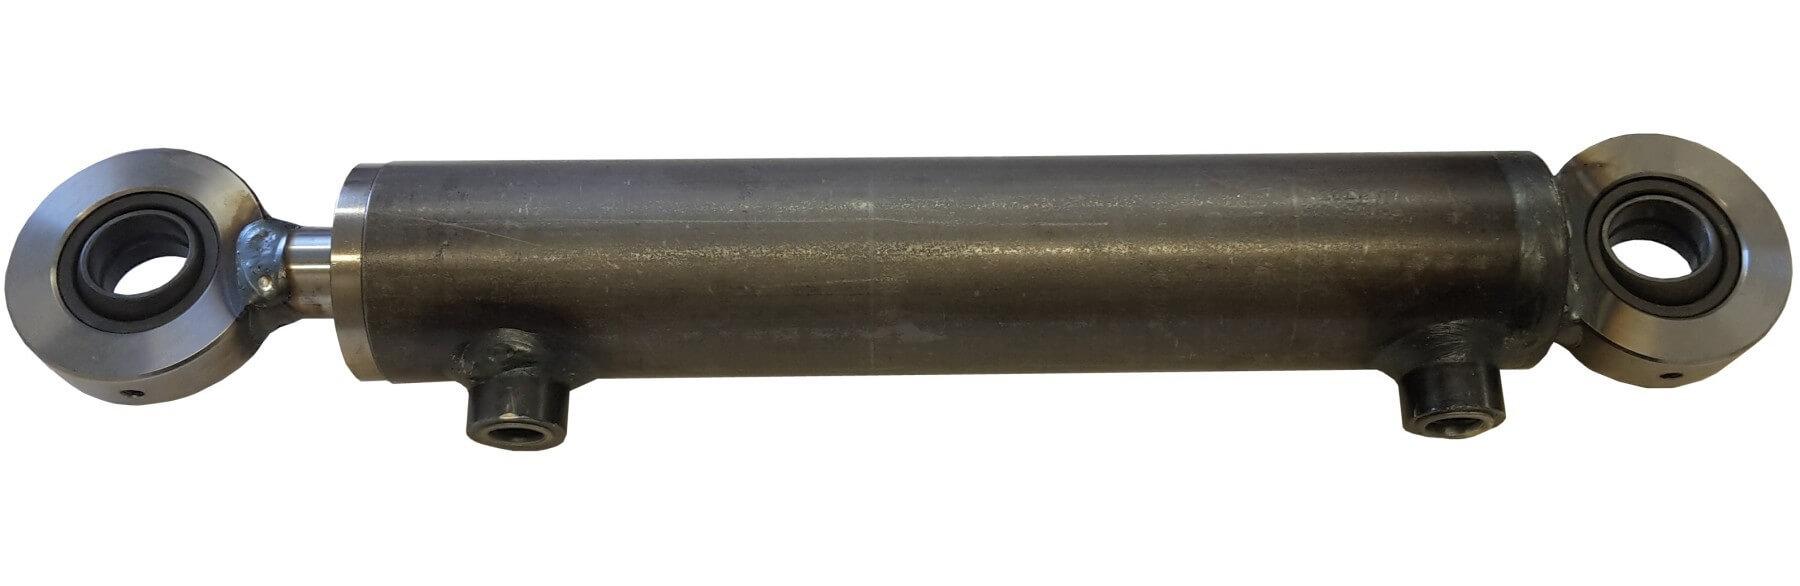 Hydraulisylinteri CL 50. 25. 400 GE